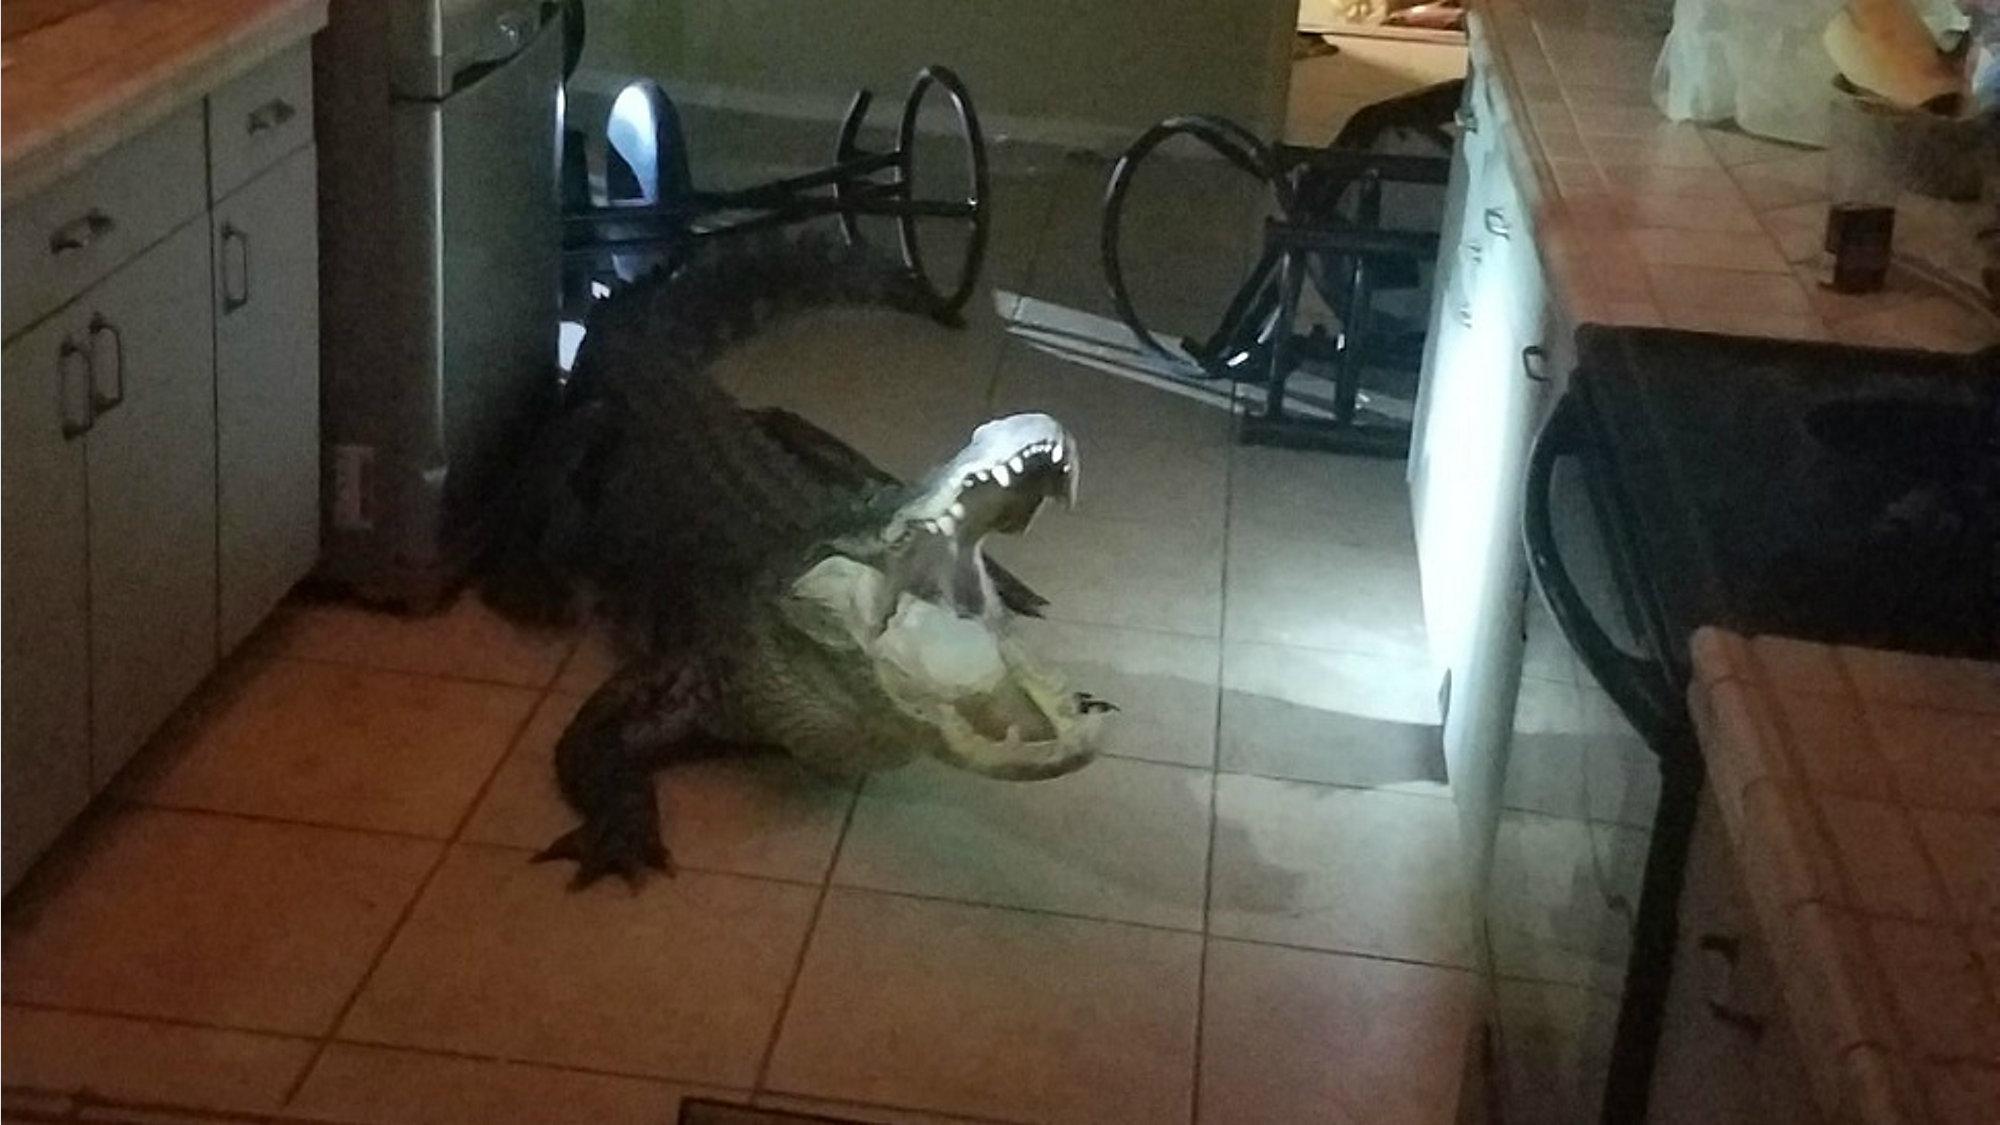 Clearwater Home Break-In Suspect: 11-Foot Alligator